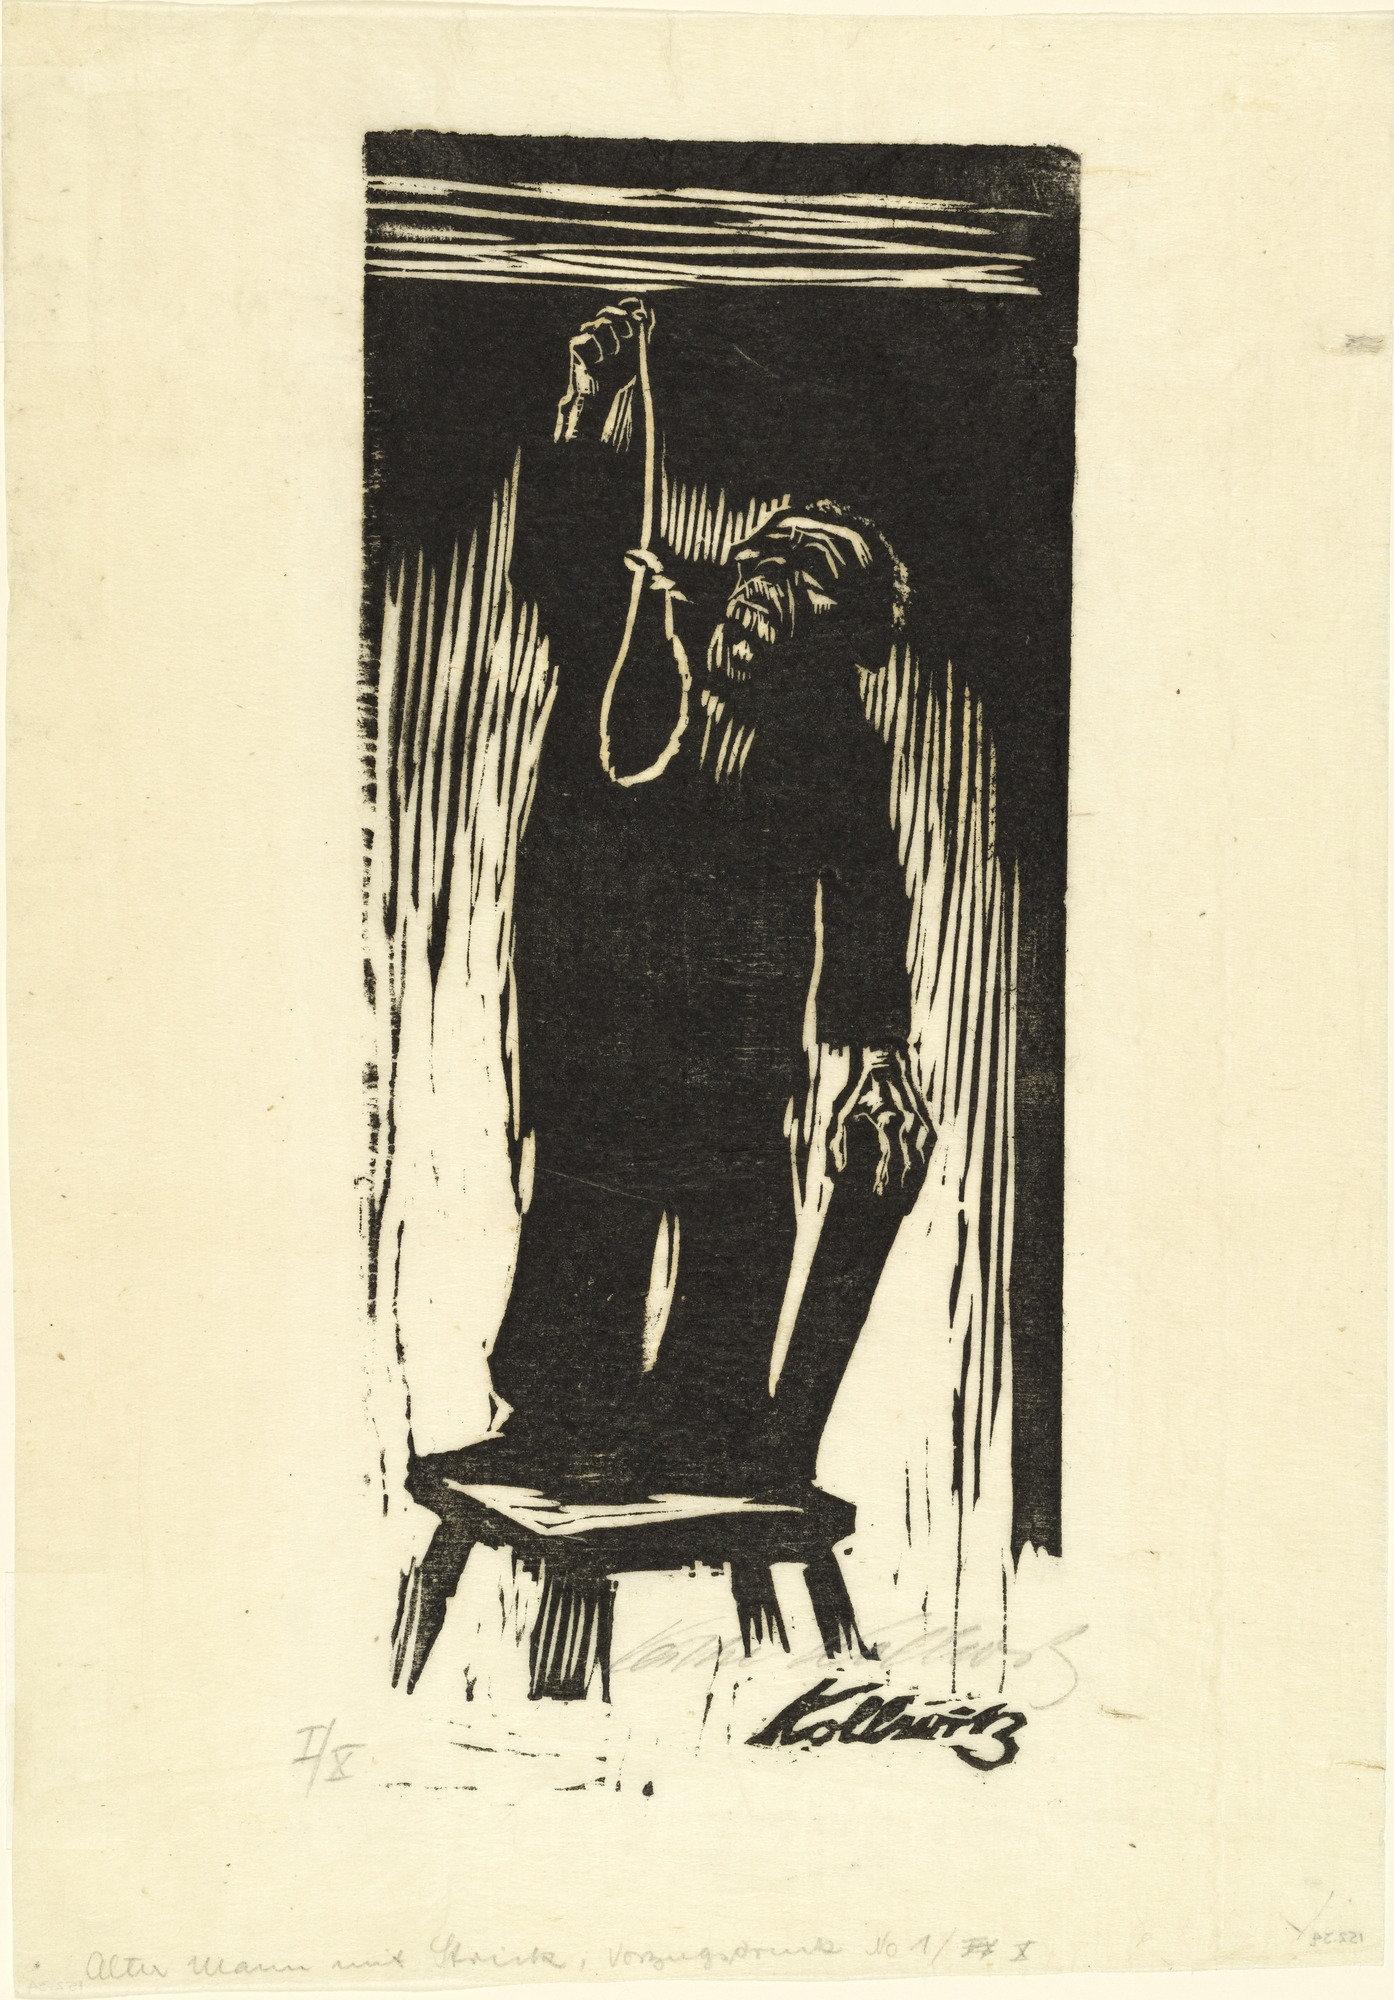 Käthe Kollwitz, Das Letzte (1924; xilografia, 29,4 x 12,8 cm; New York, The Metropolitan Museum)